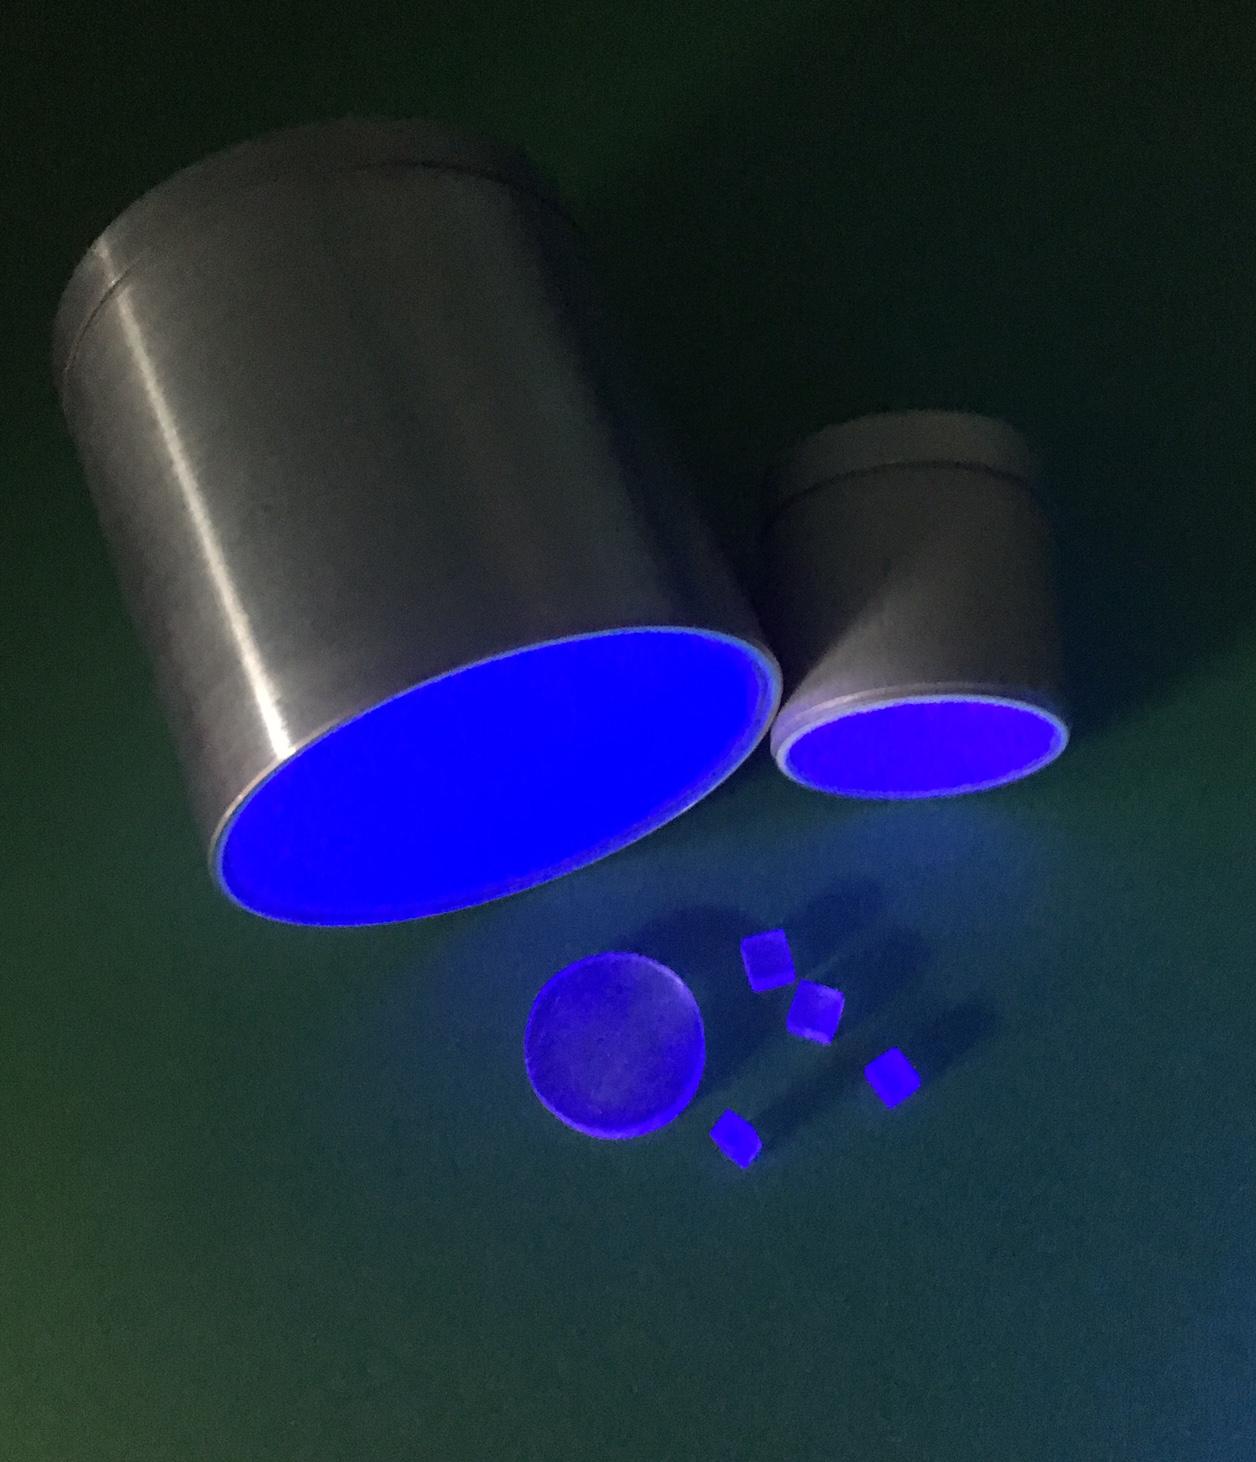 Proteus engineered scintillation material